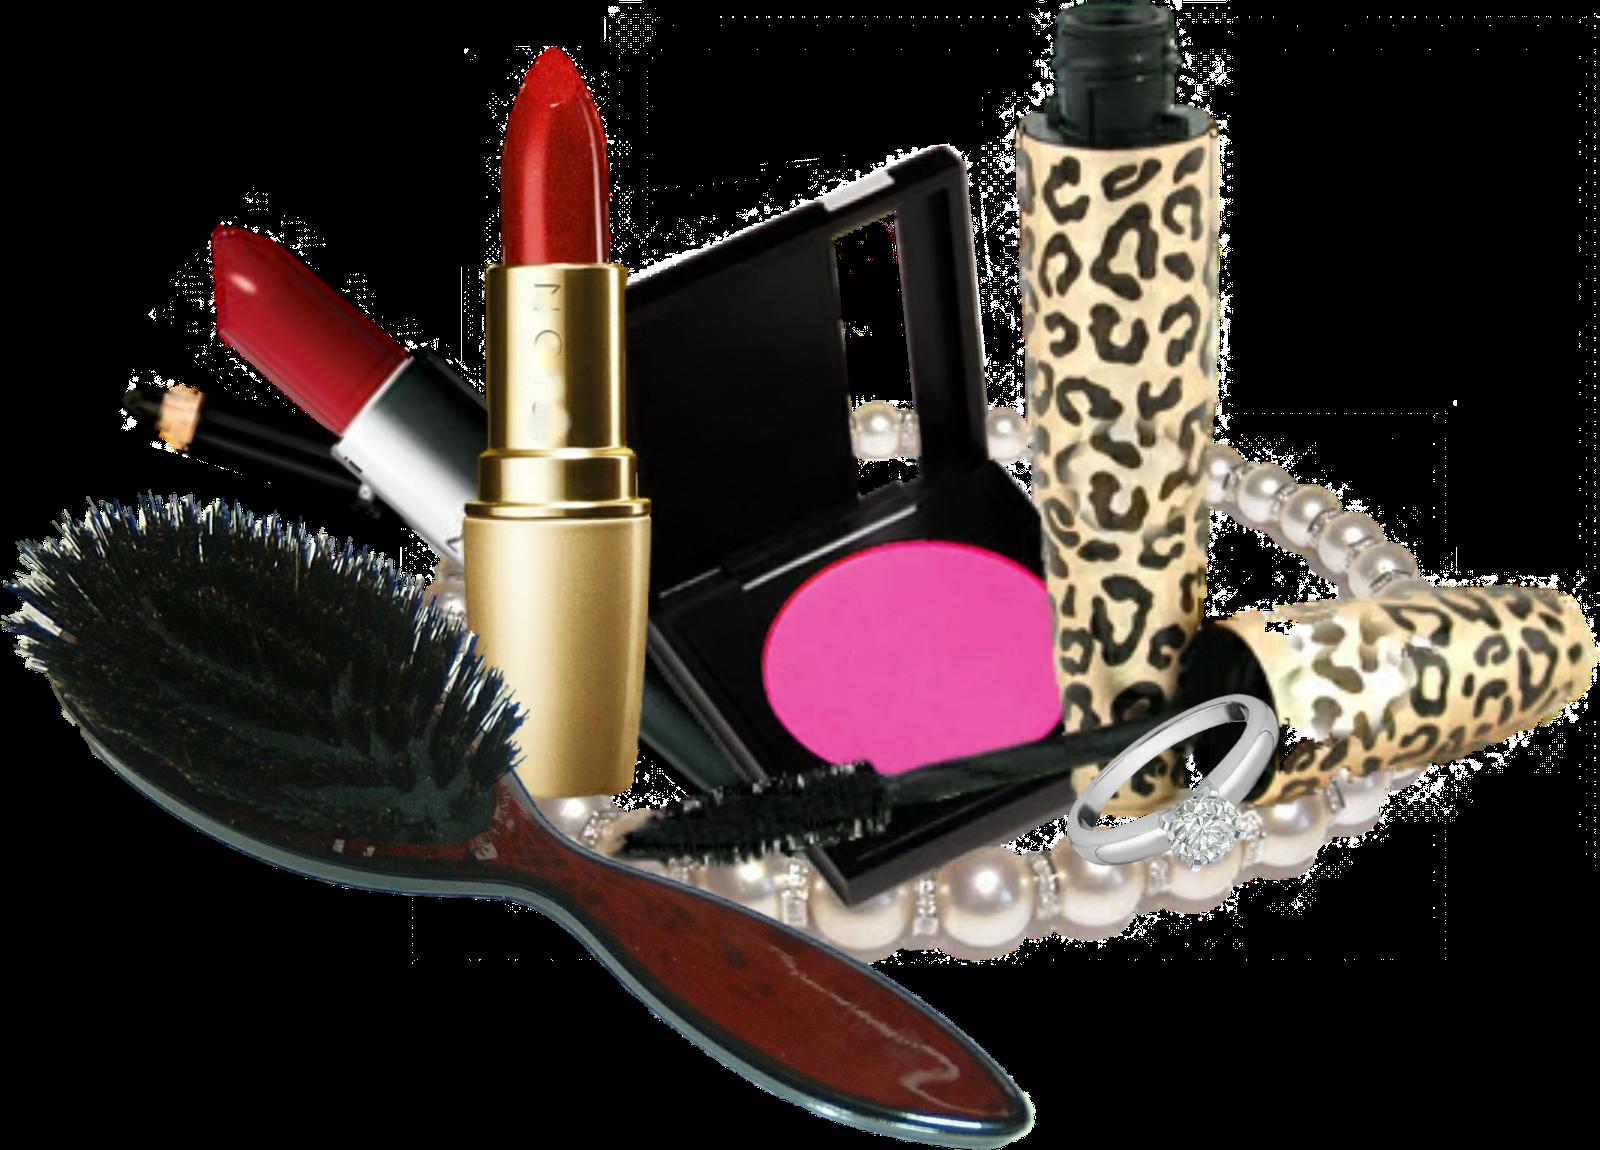 Makeup clipart transparent transparent library Makeup Kit Products PNG Transparent Images | PNG All transparent library